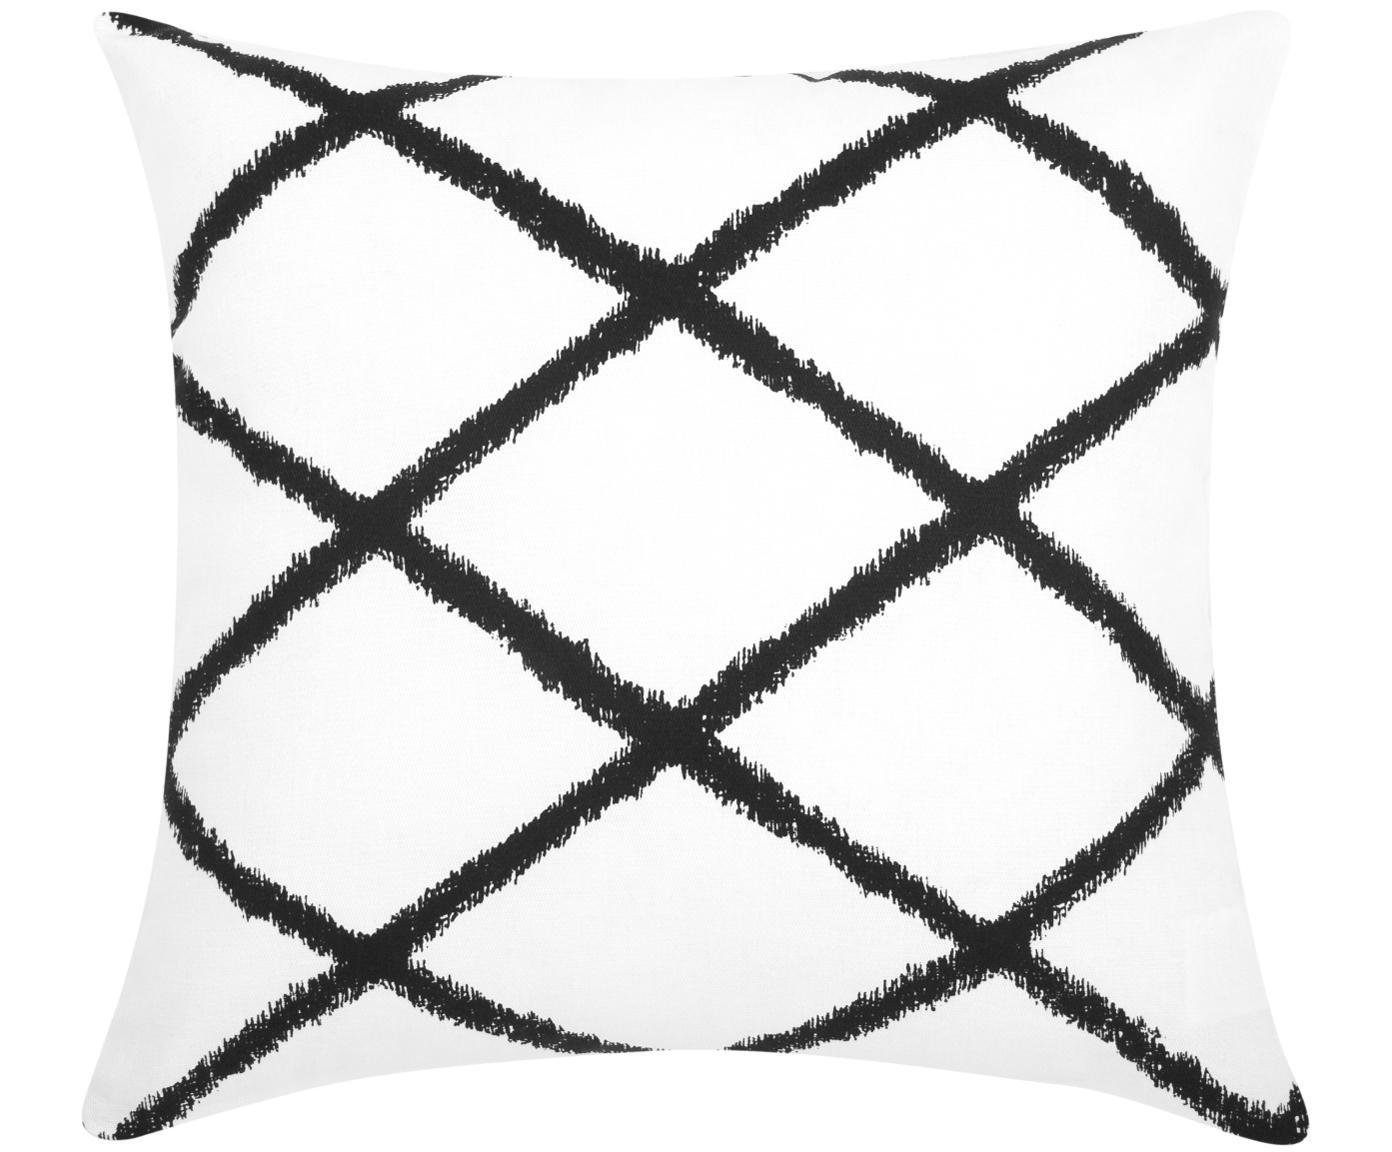 Kussenhoes Laila, 100% katoen, Wit, zwart, 45 x 45 cm